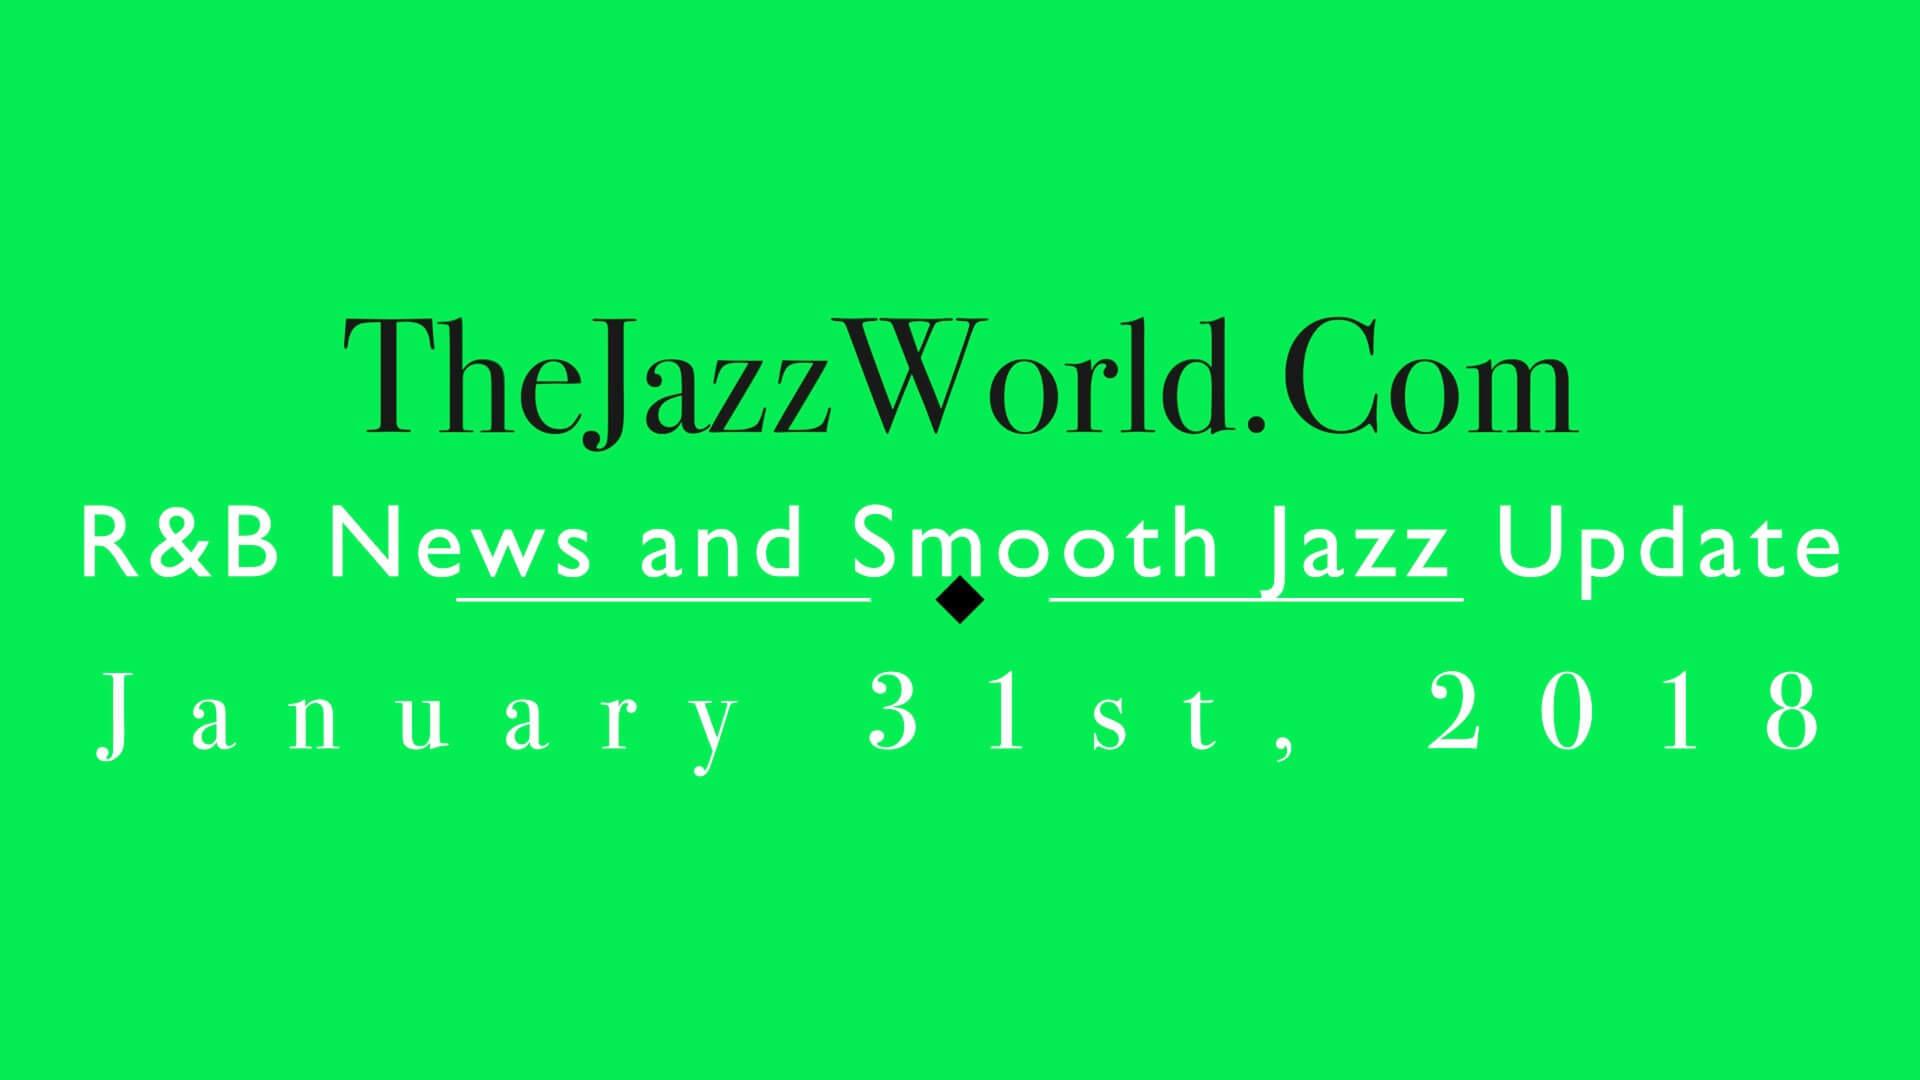 The Jazz World Show 1:31:18